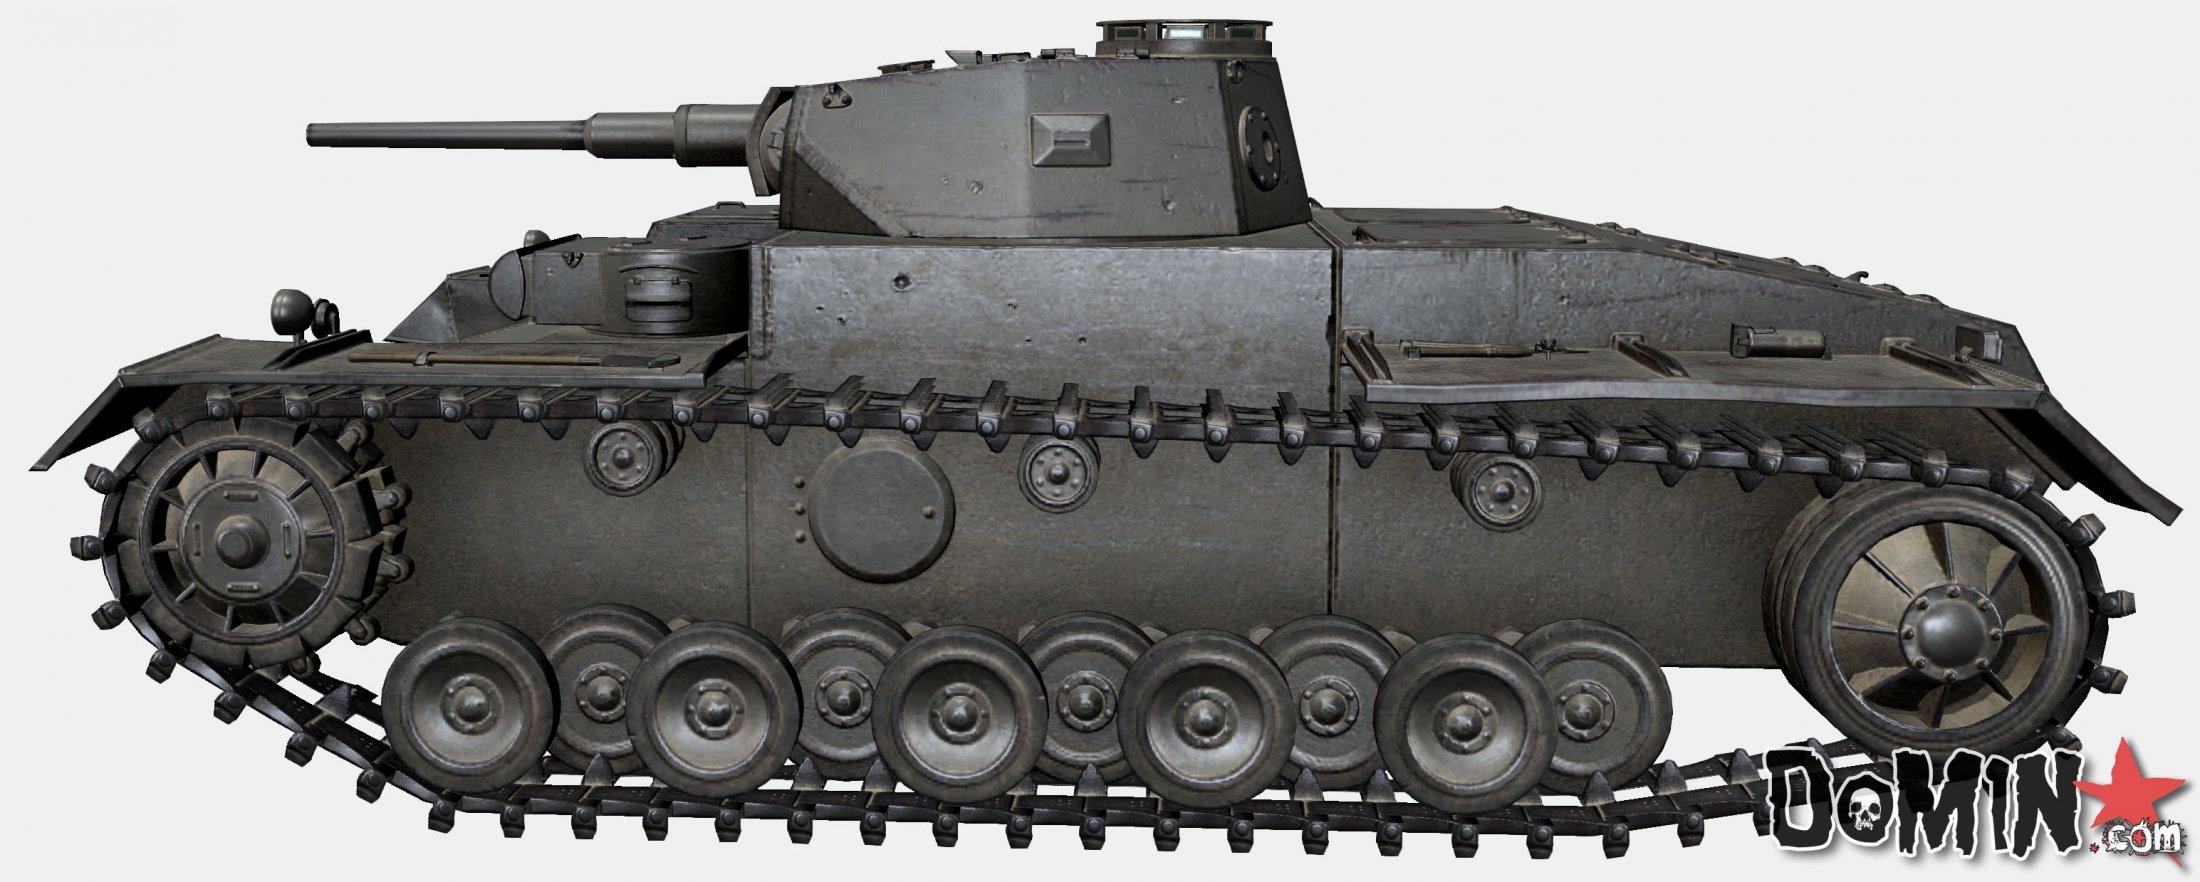 Vk652